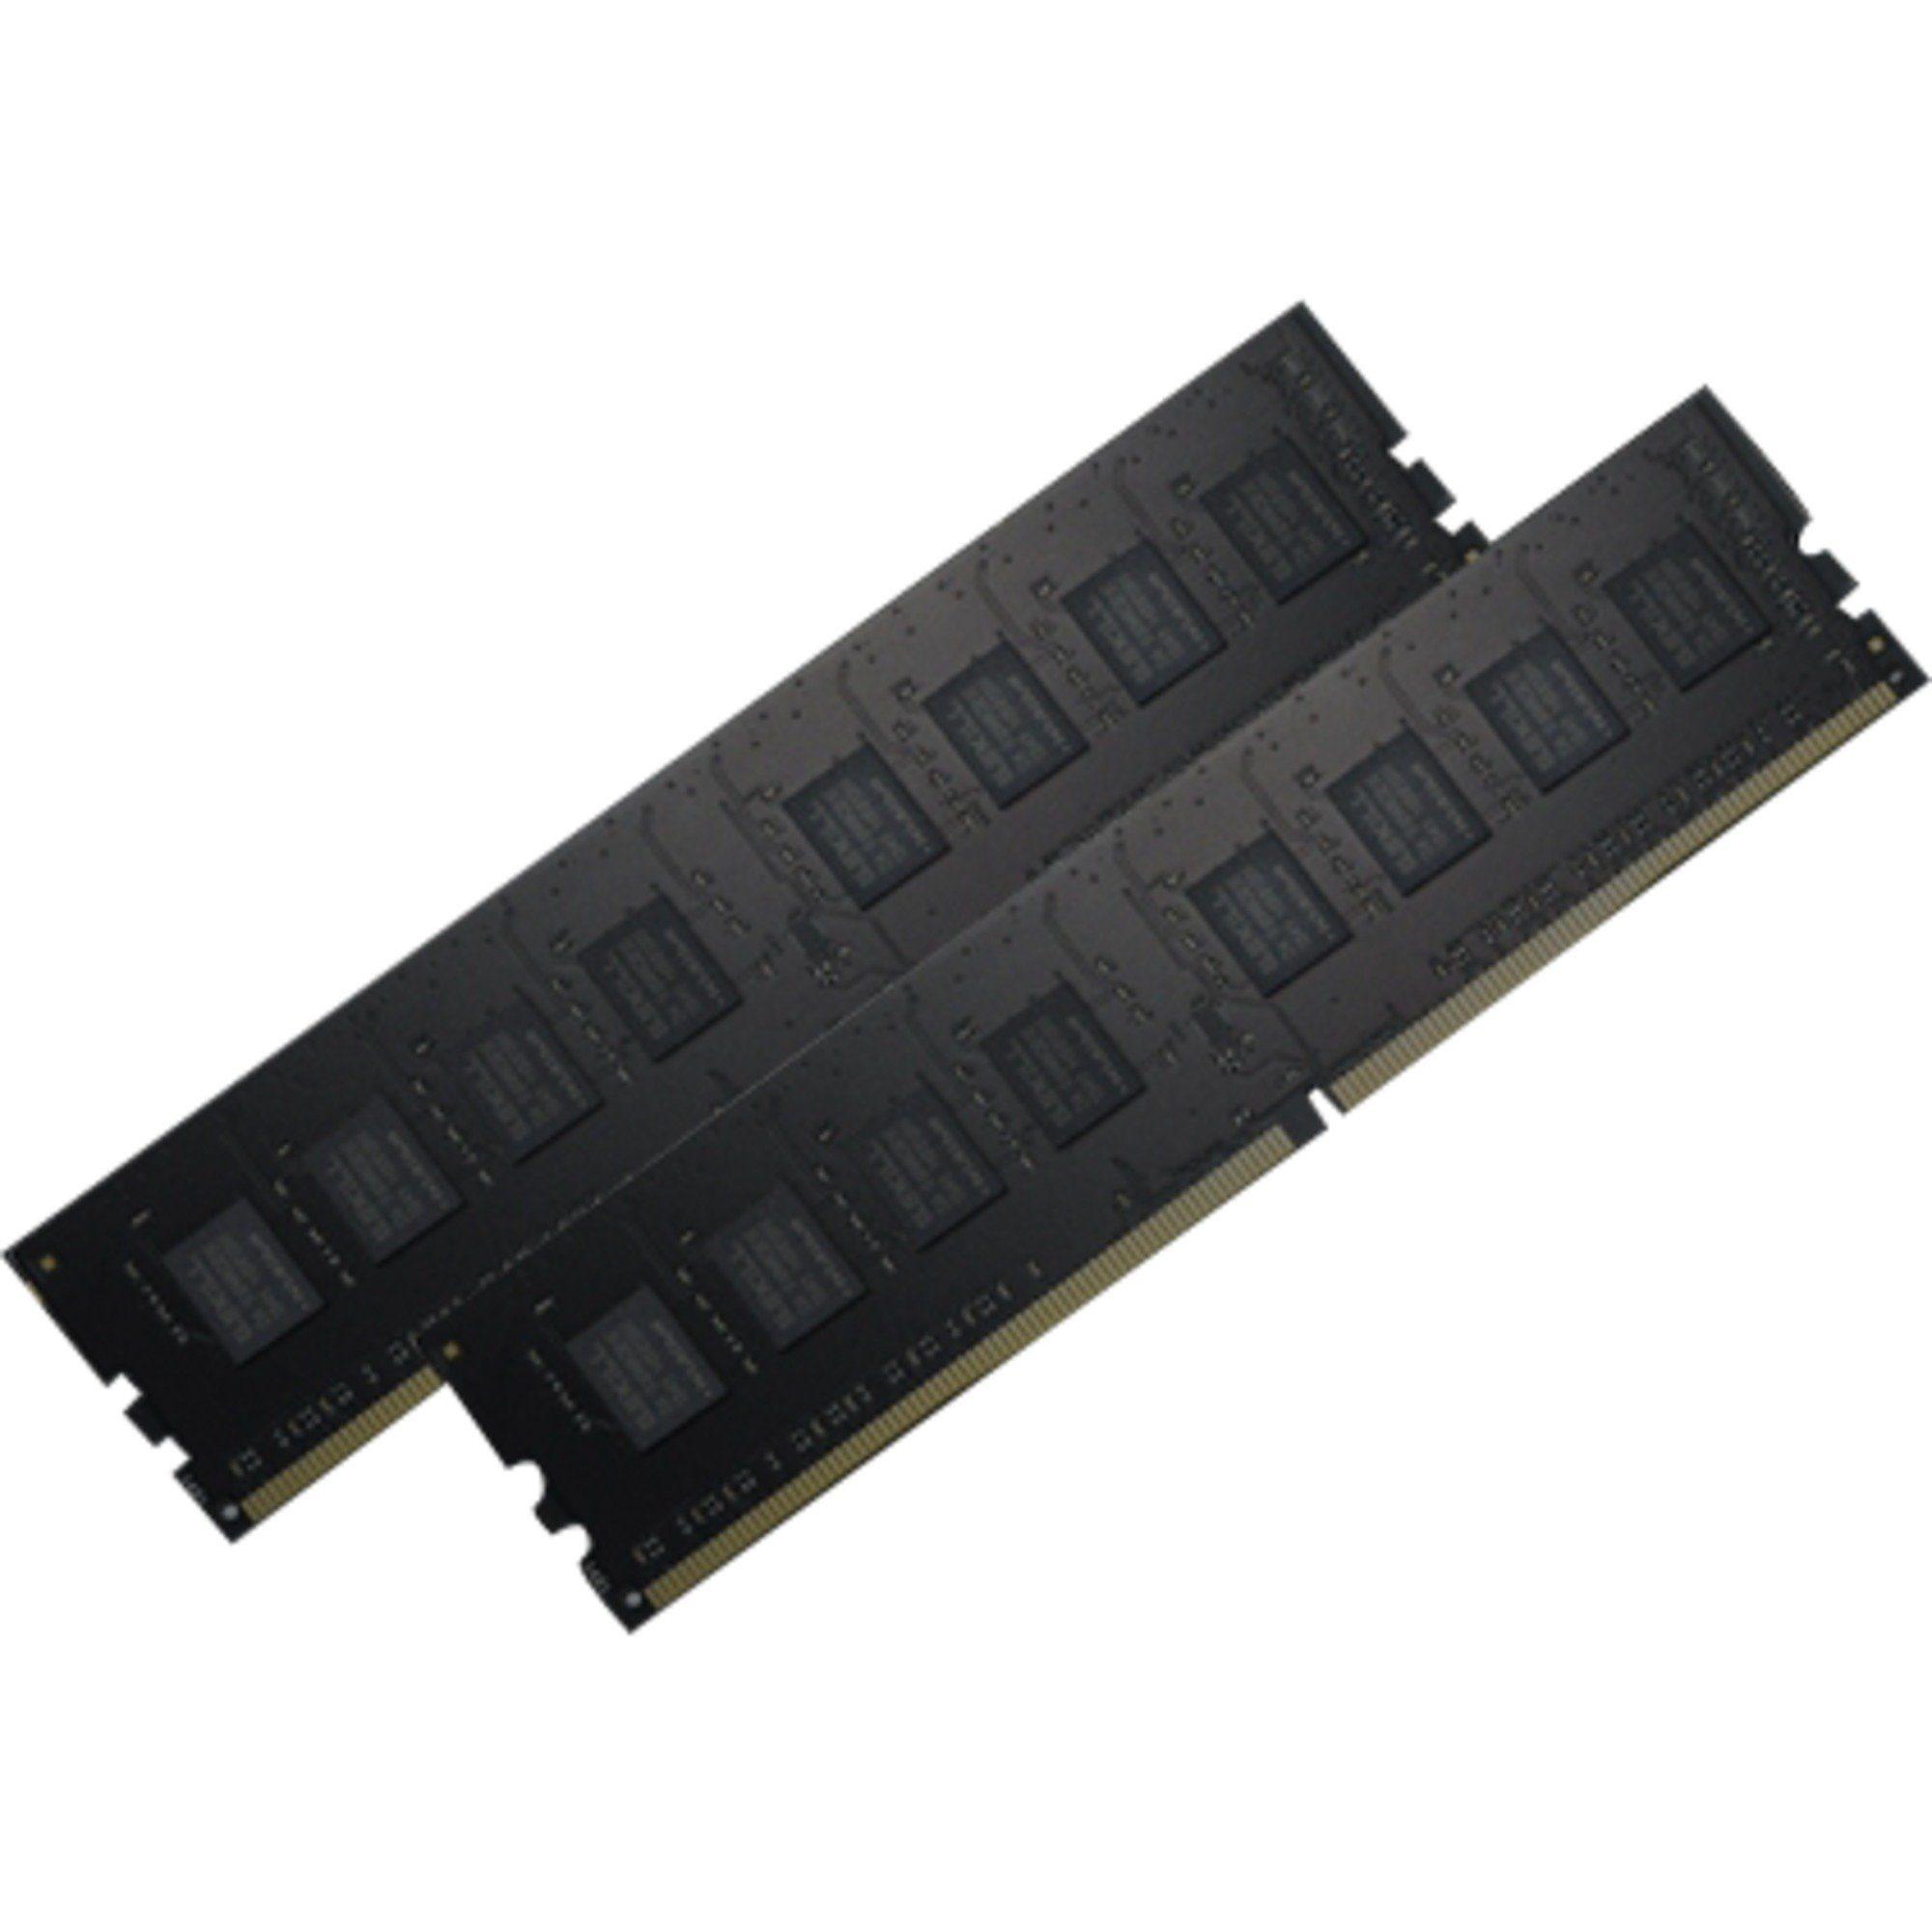 G.Skill Arbeitsspeicher »DIMM 16GB DDR4-2133 Kit, F4-2133C15D-16GNT, Value«